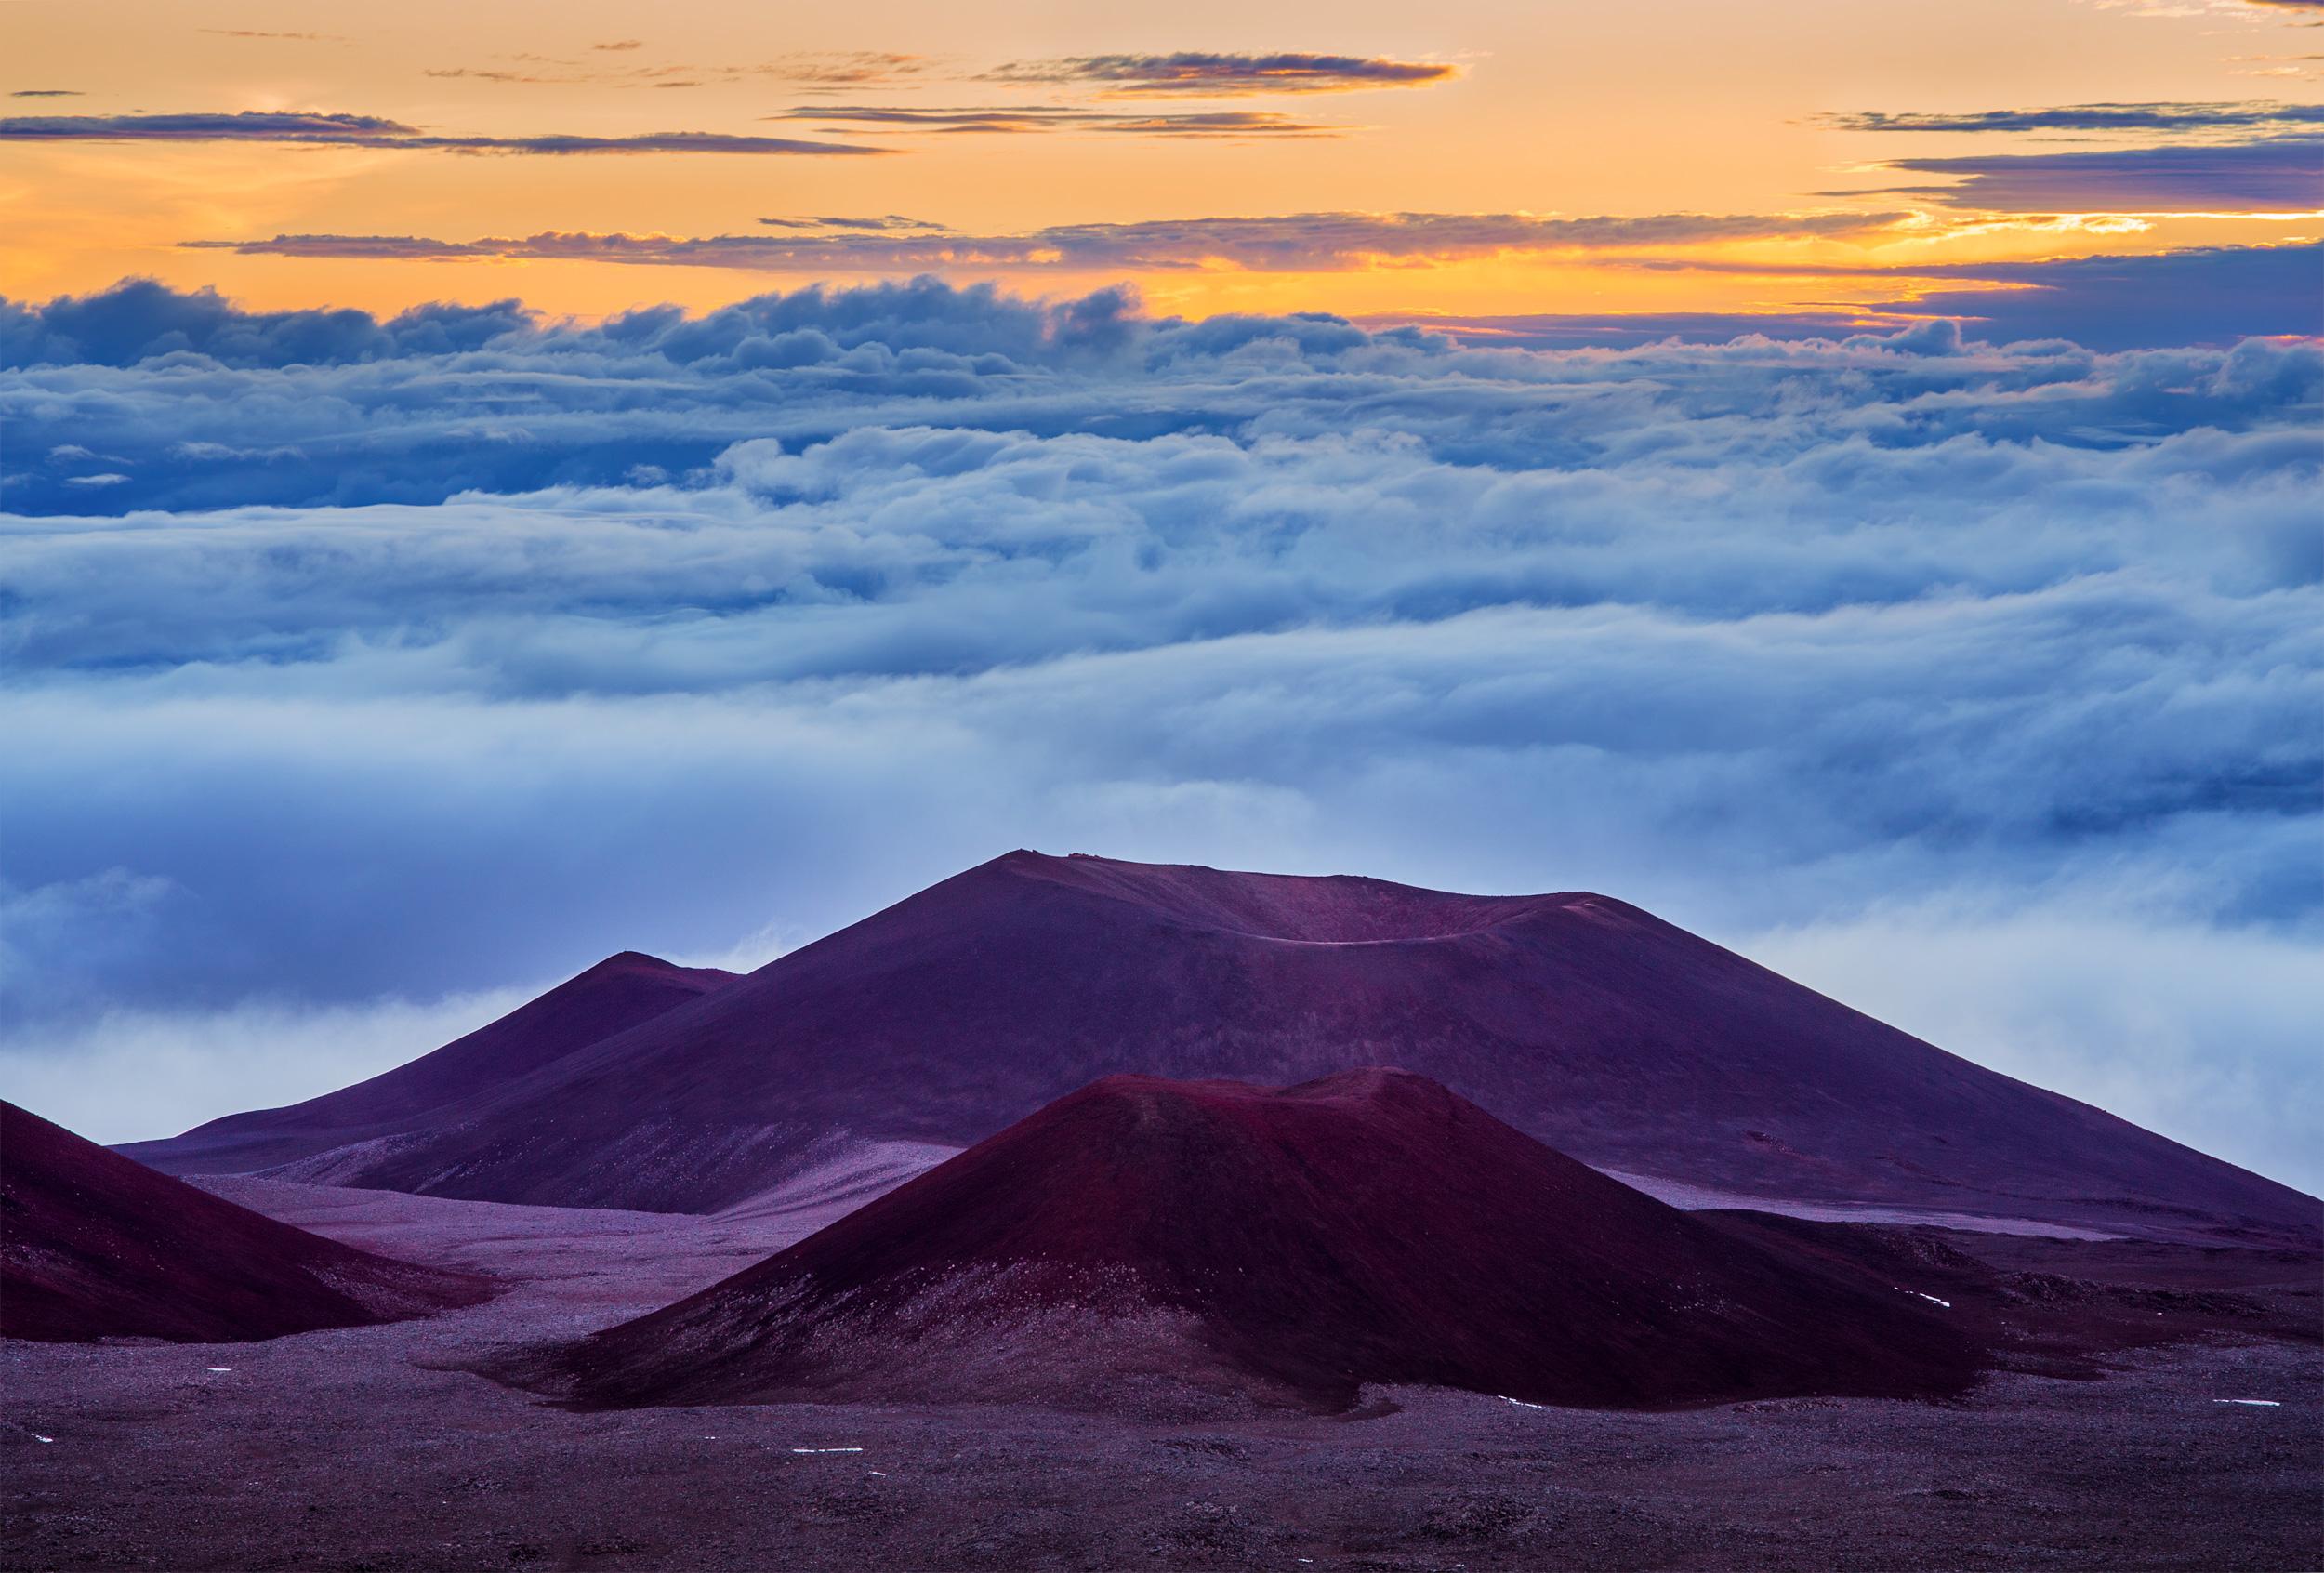 Mauna Kea Volcano Sunrise -Close to 14000 ft, on top of Mauna Kea, a dormant volcano, at the roof of Hawaii.